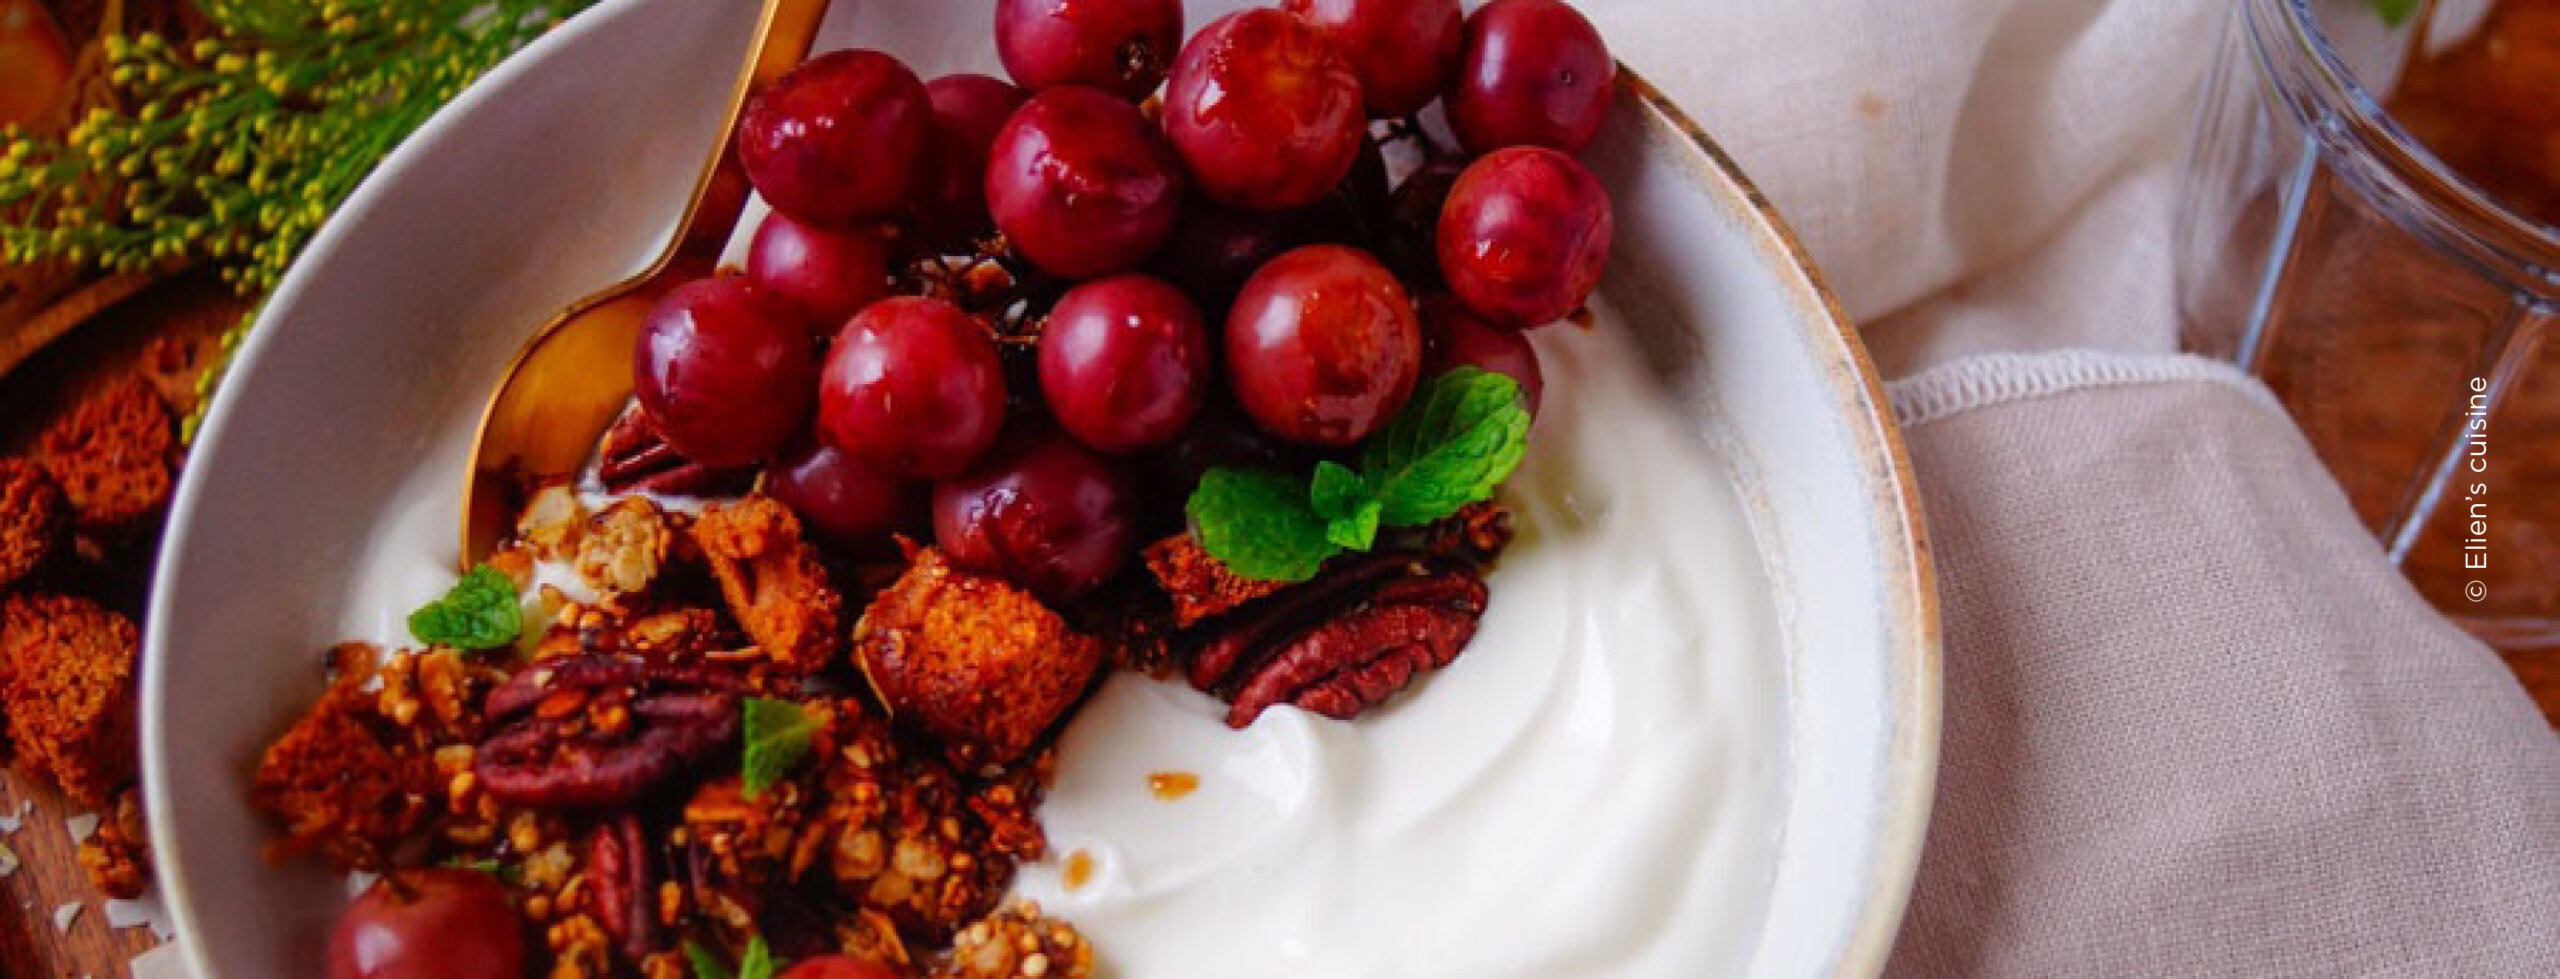 Granola met honingkoek